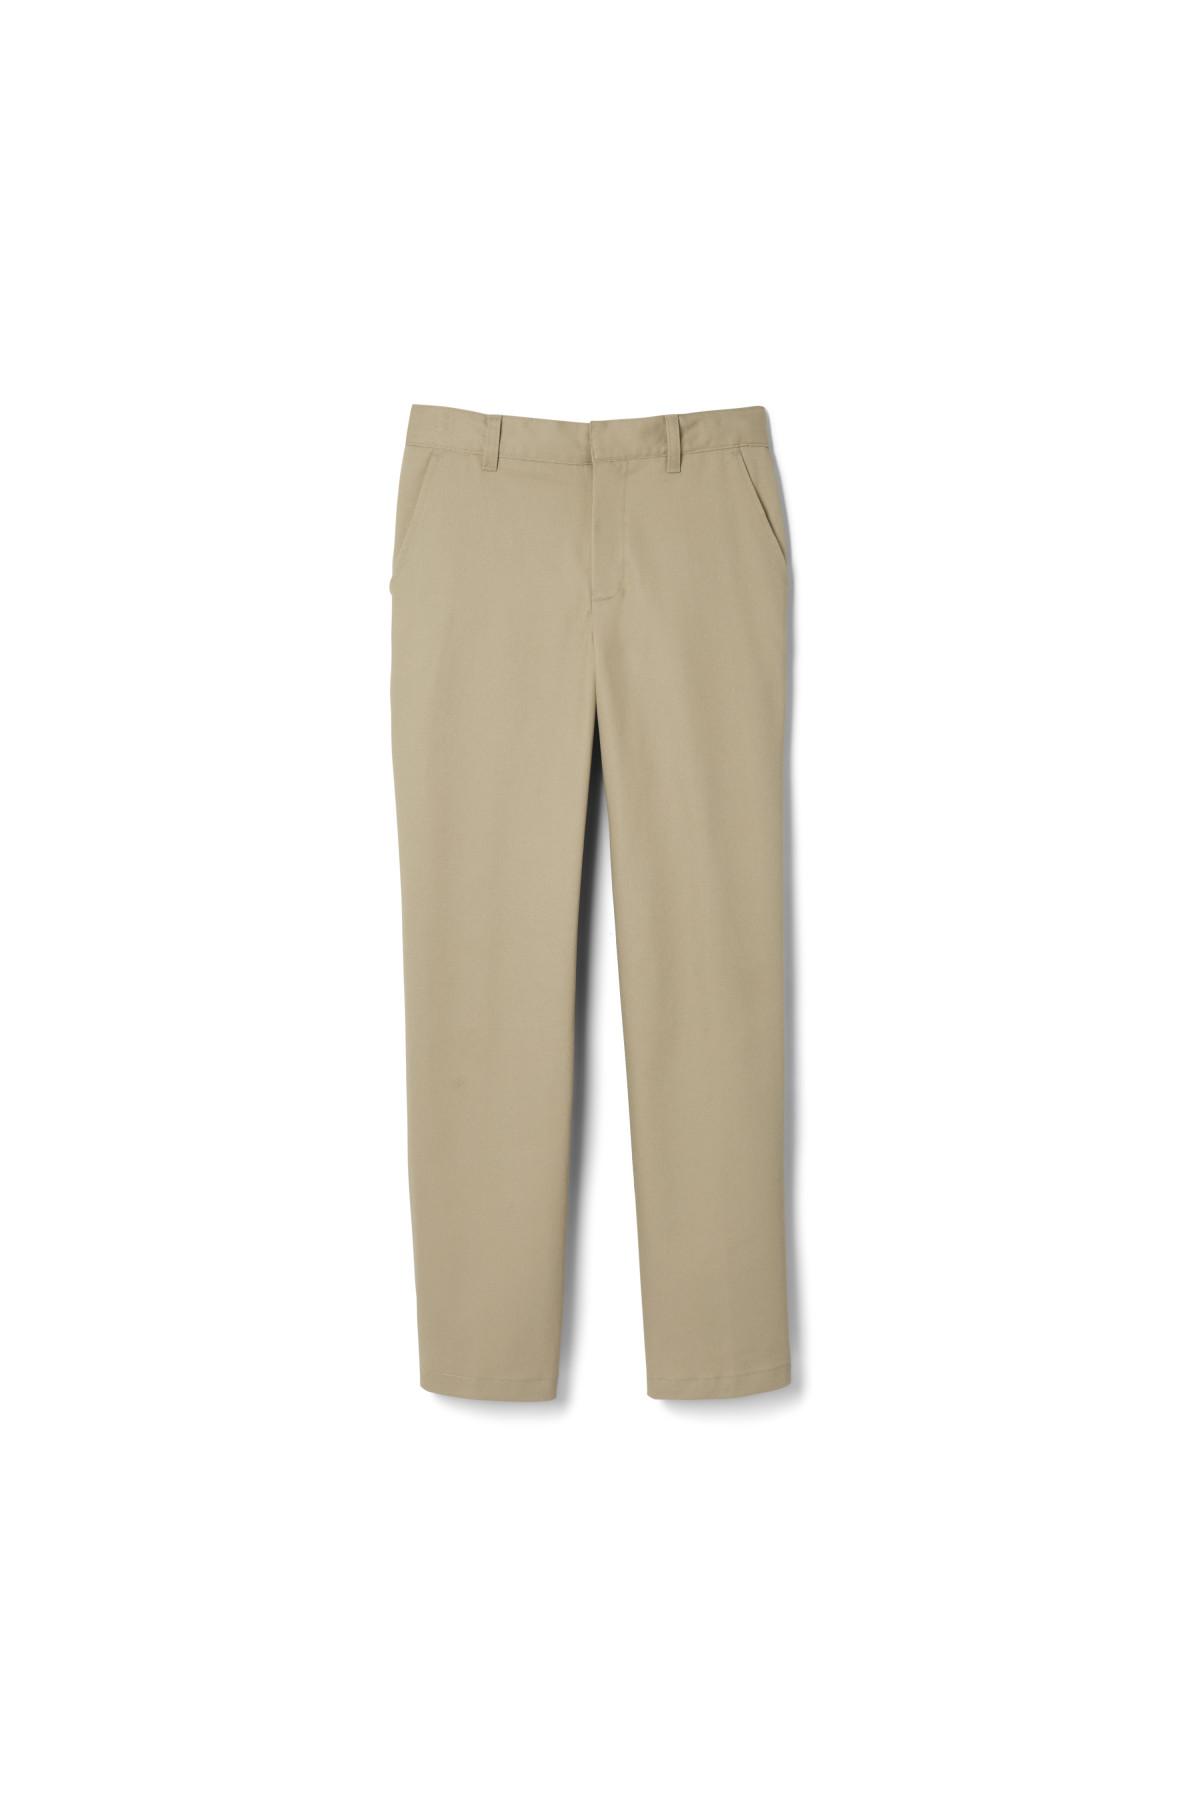 Boys School Uniform Adjustable Waist Regular Fit Teflon Coating Formal Trousers